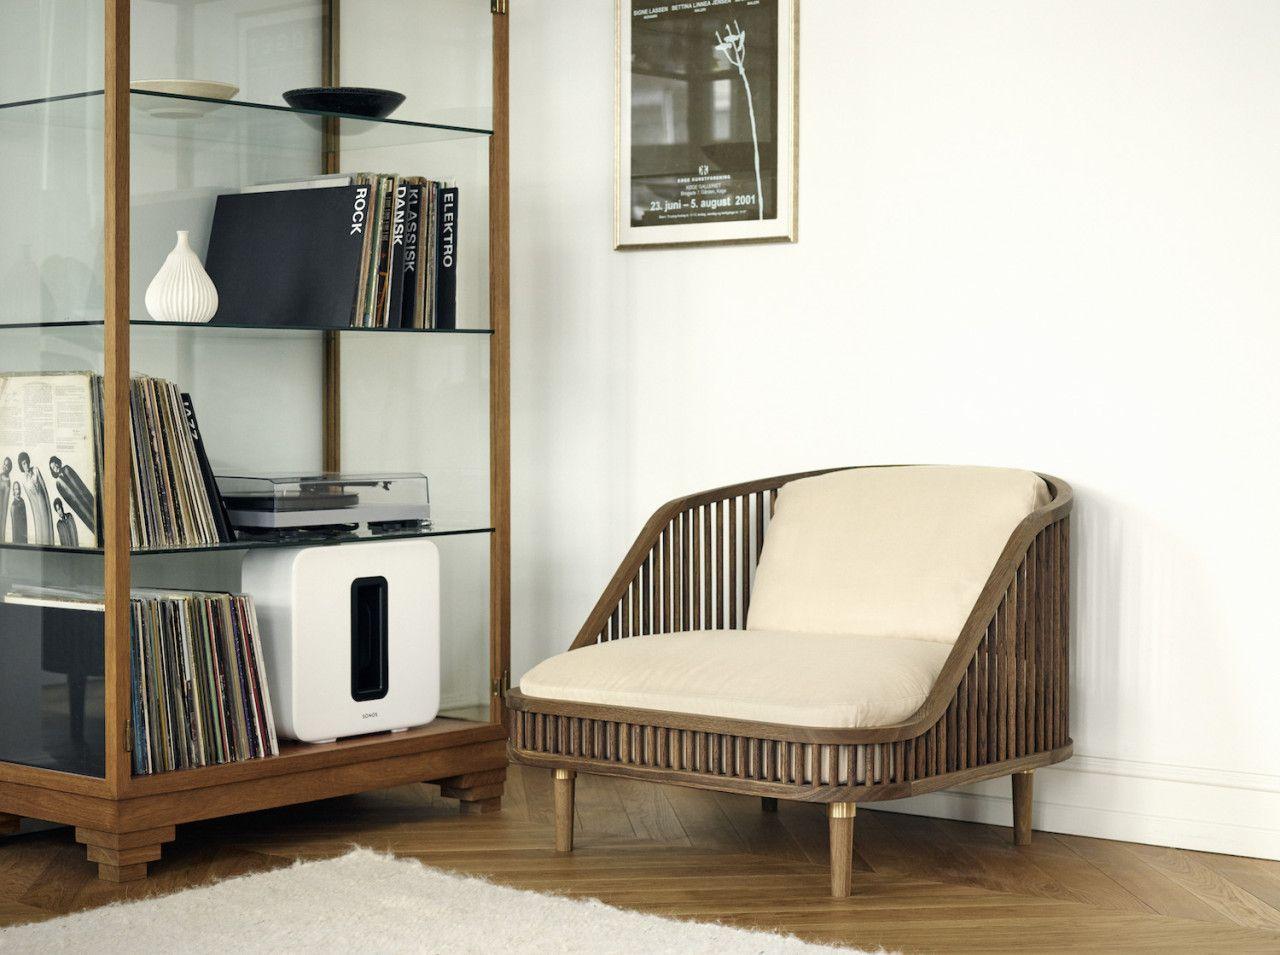 KBH Chair by KBH Studio | Sonos, Studio and Interiors